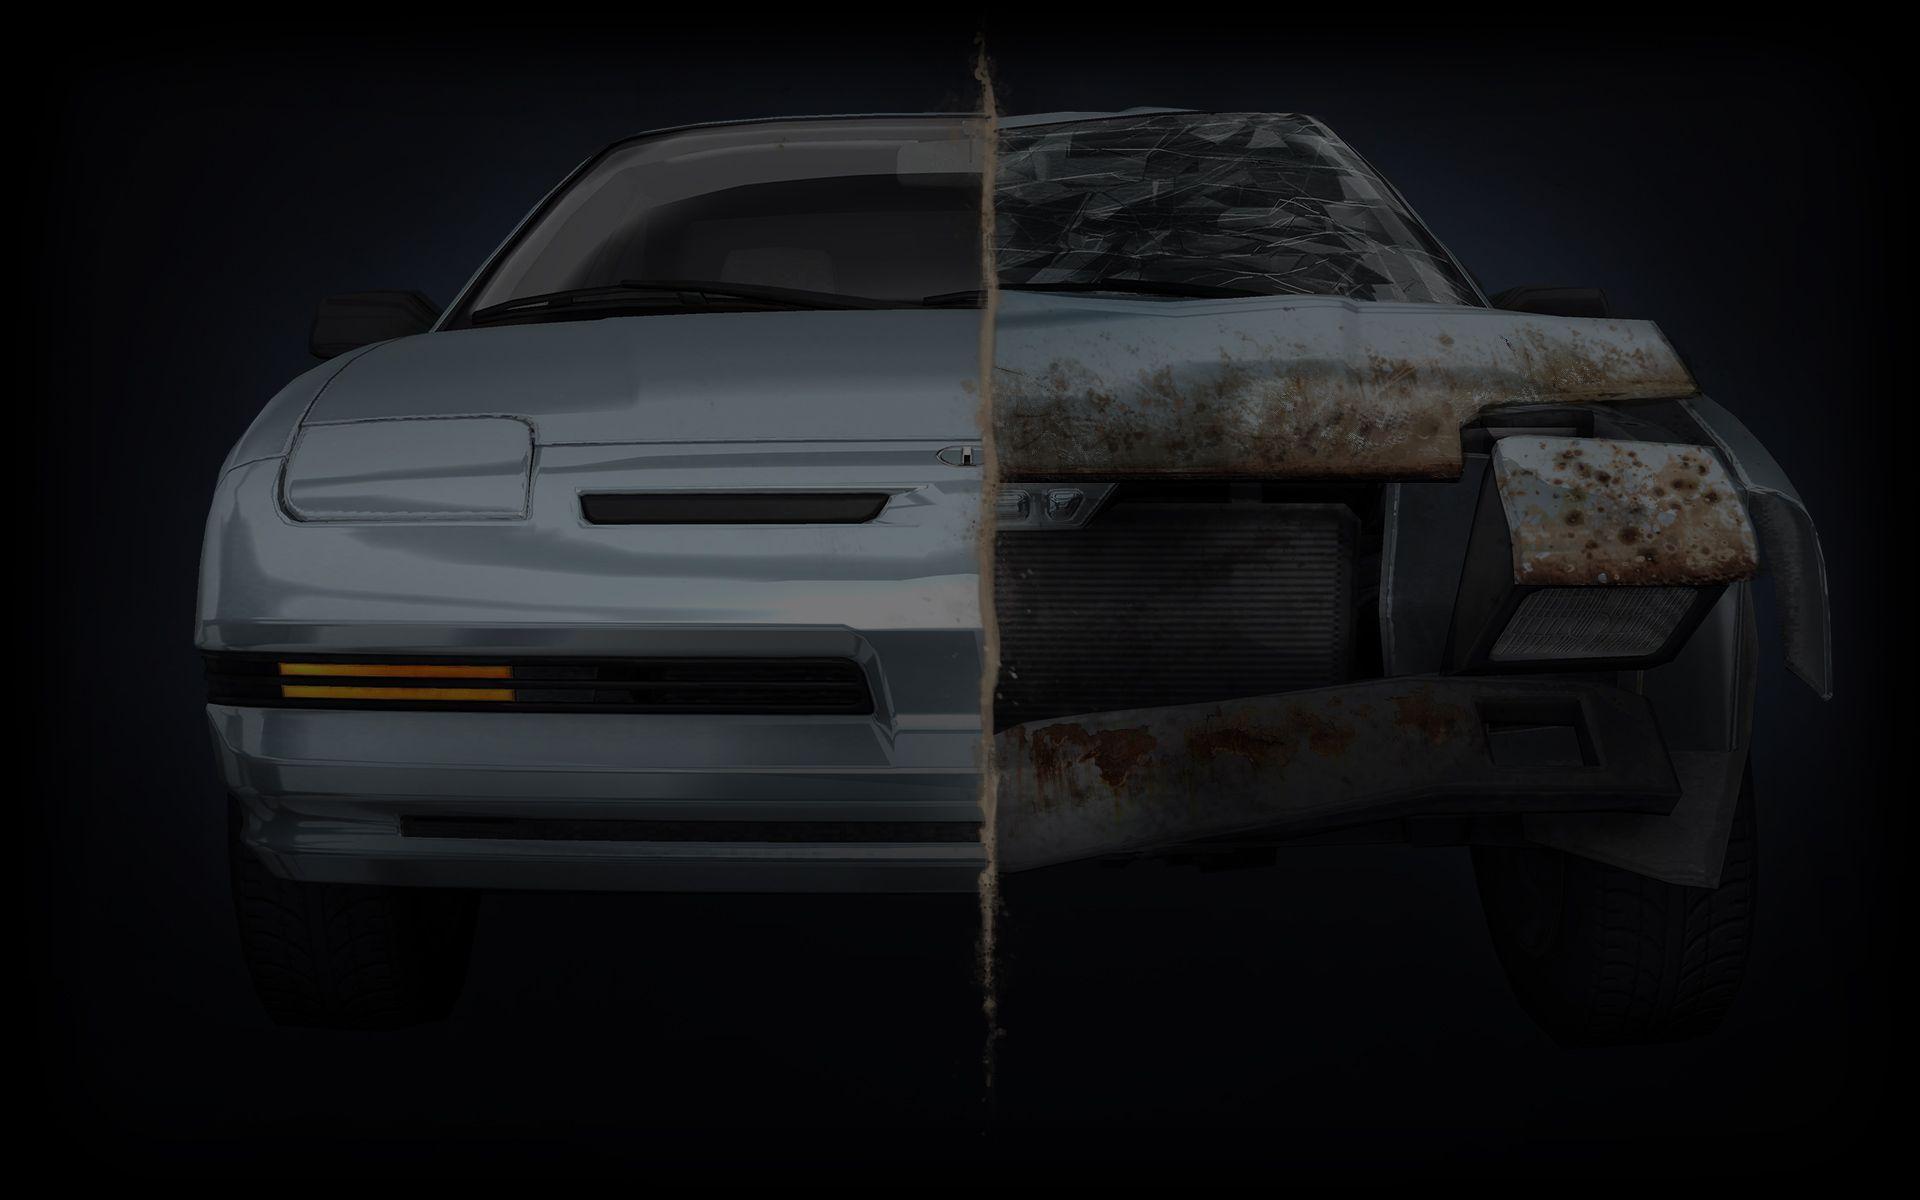 Ibishu 200bx Beamng Drive With Images Driving Car Crash